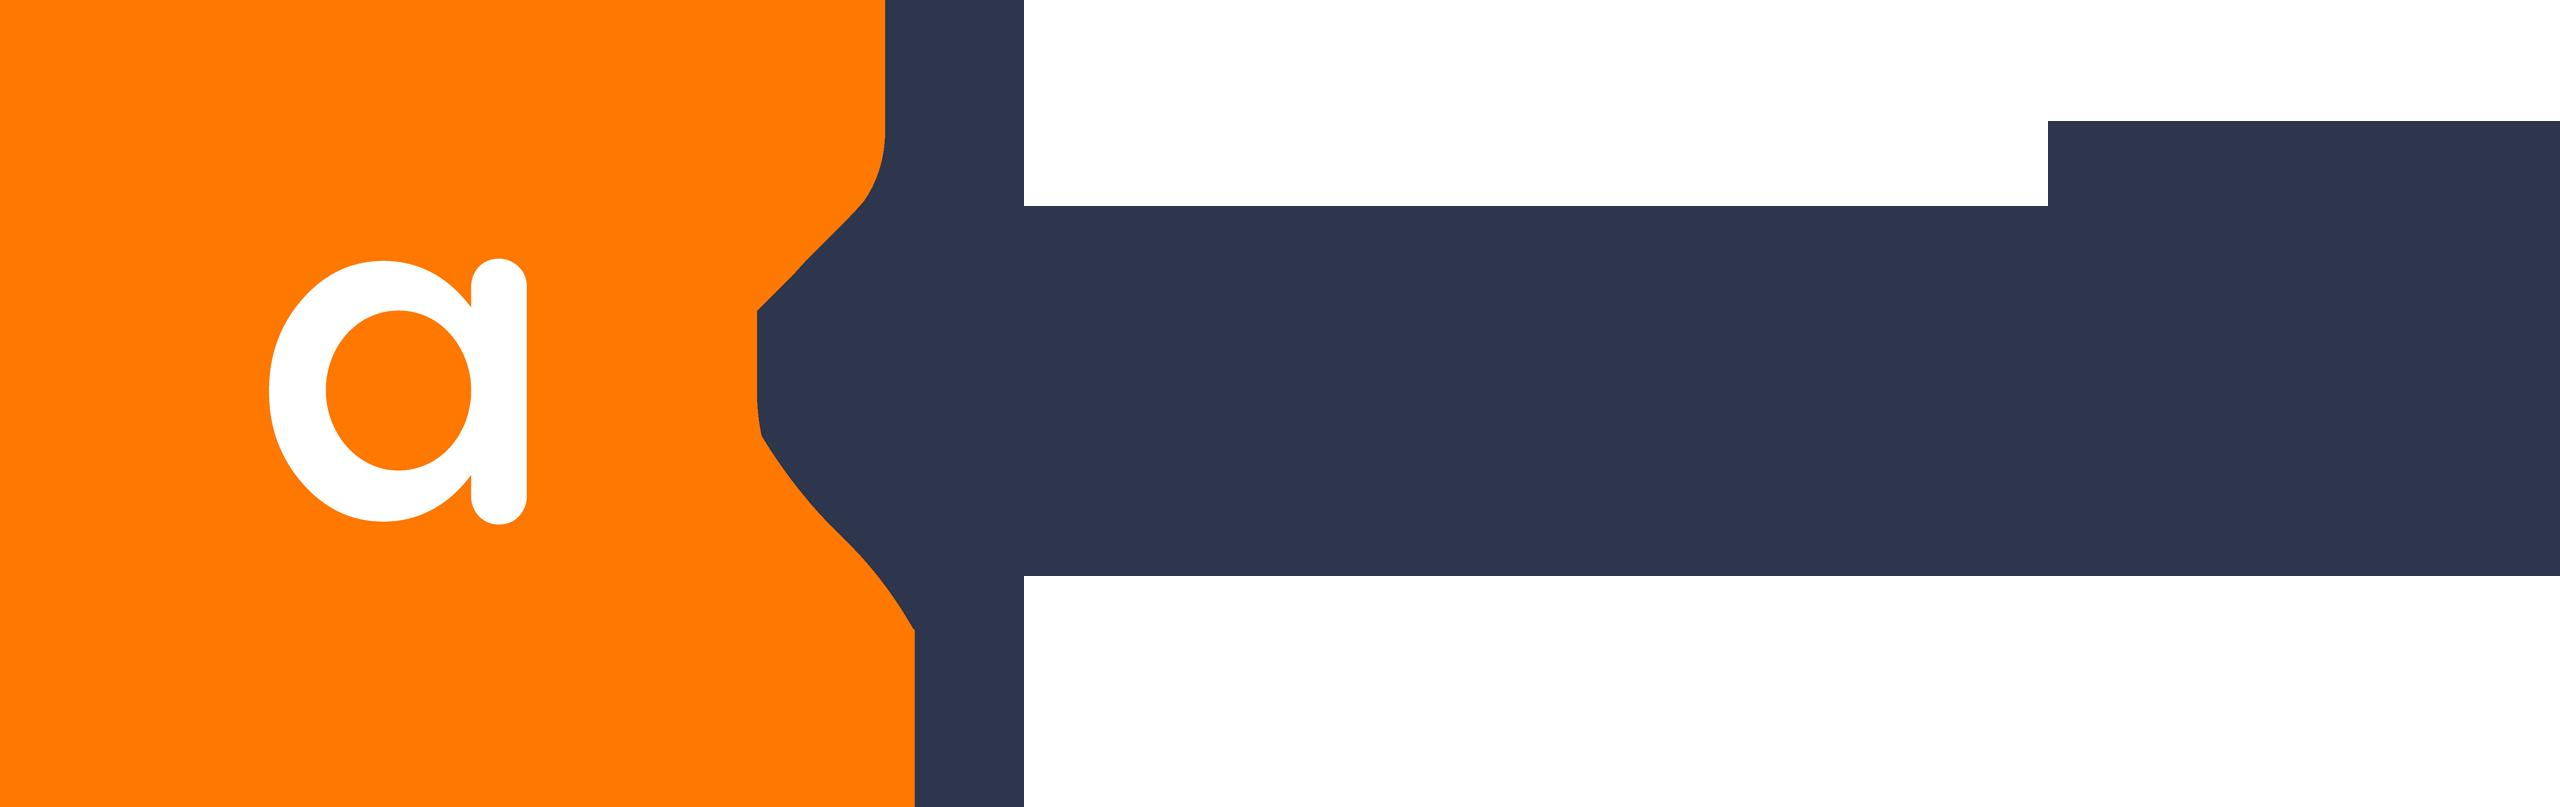 Logo Avast (RGB, PNG) PlusPng.com  - Avast PNG